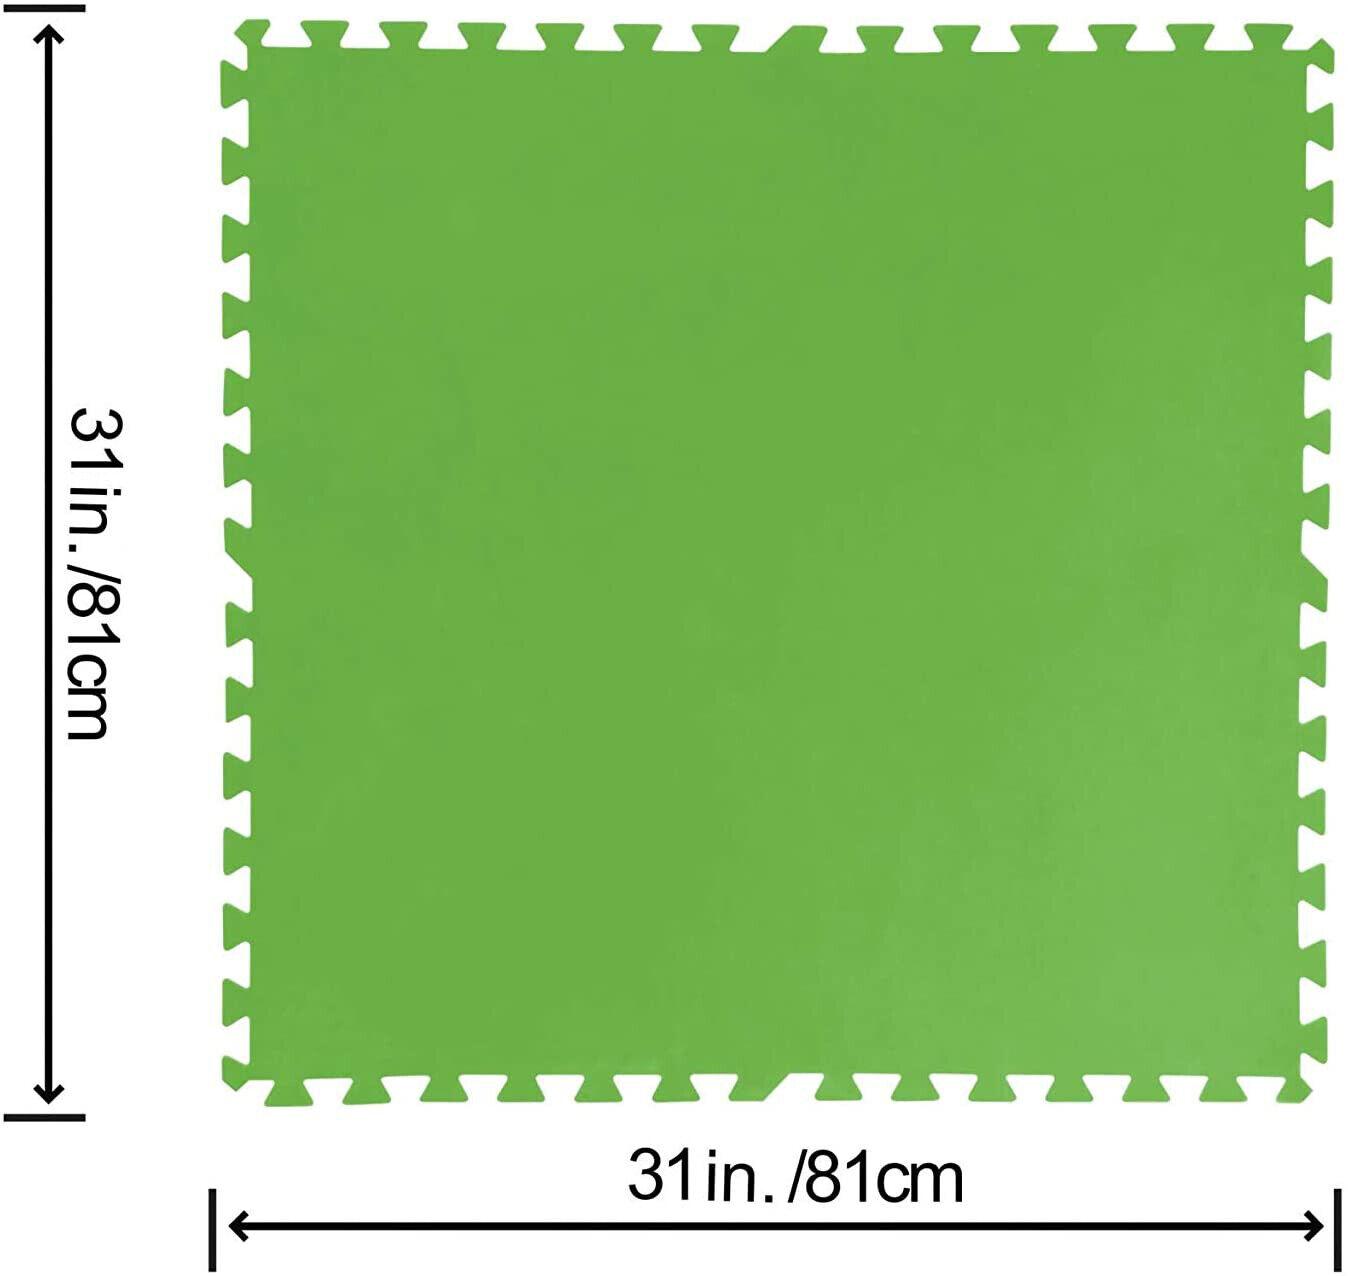 Bestway Lay Z Spa Pool and Spa Green Floor Protector - 9 of 31